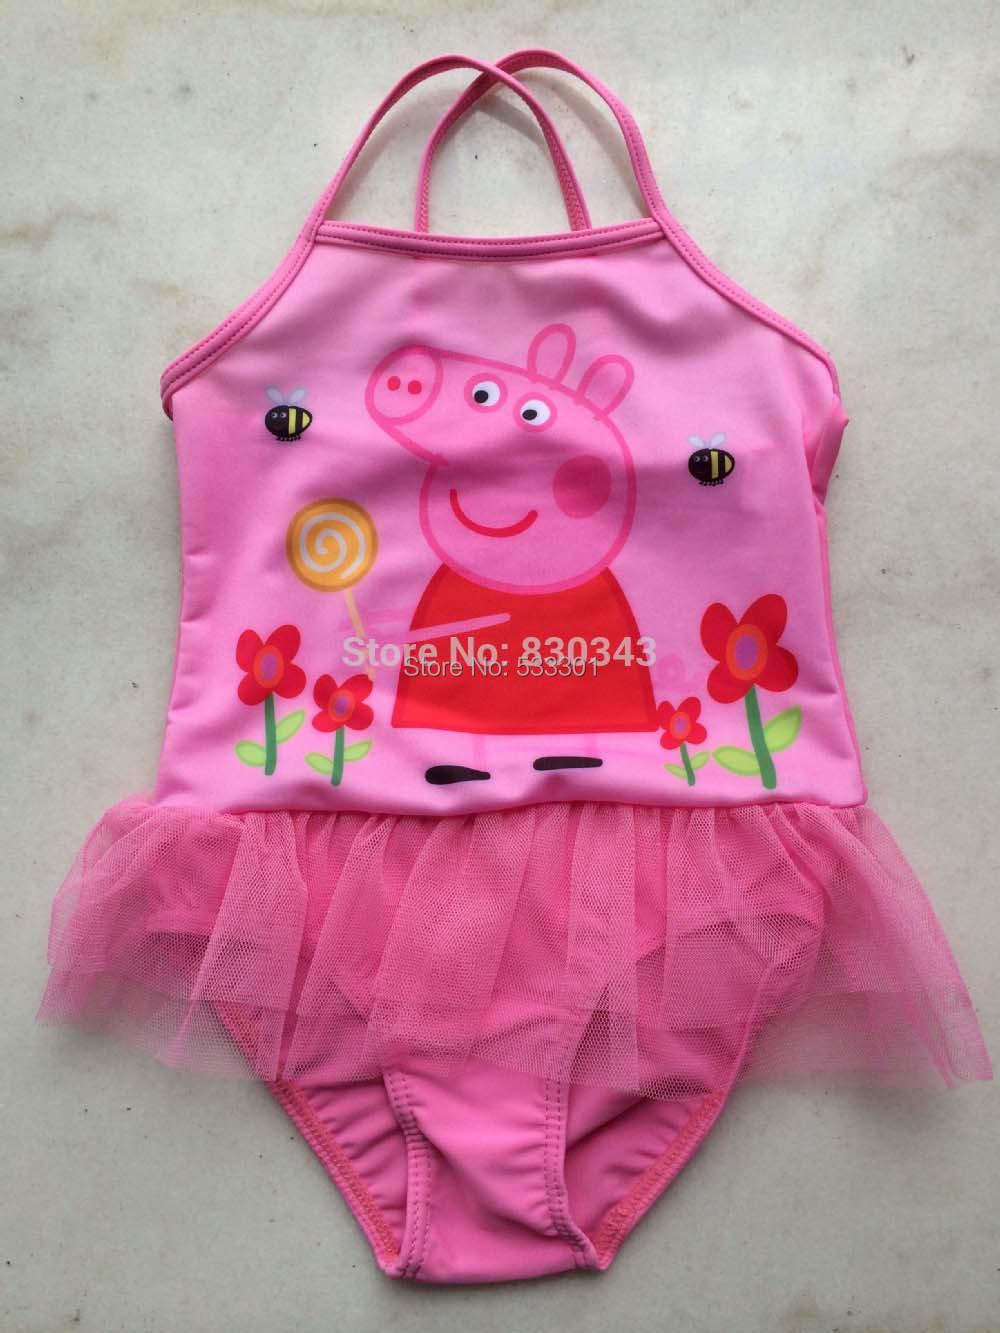 Acquista all 39 ingrosso online peppa pig costumi da bagno da - Grossisti costumi da bagno ...